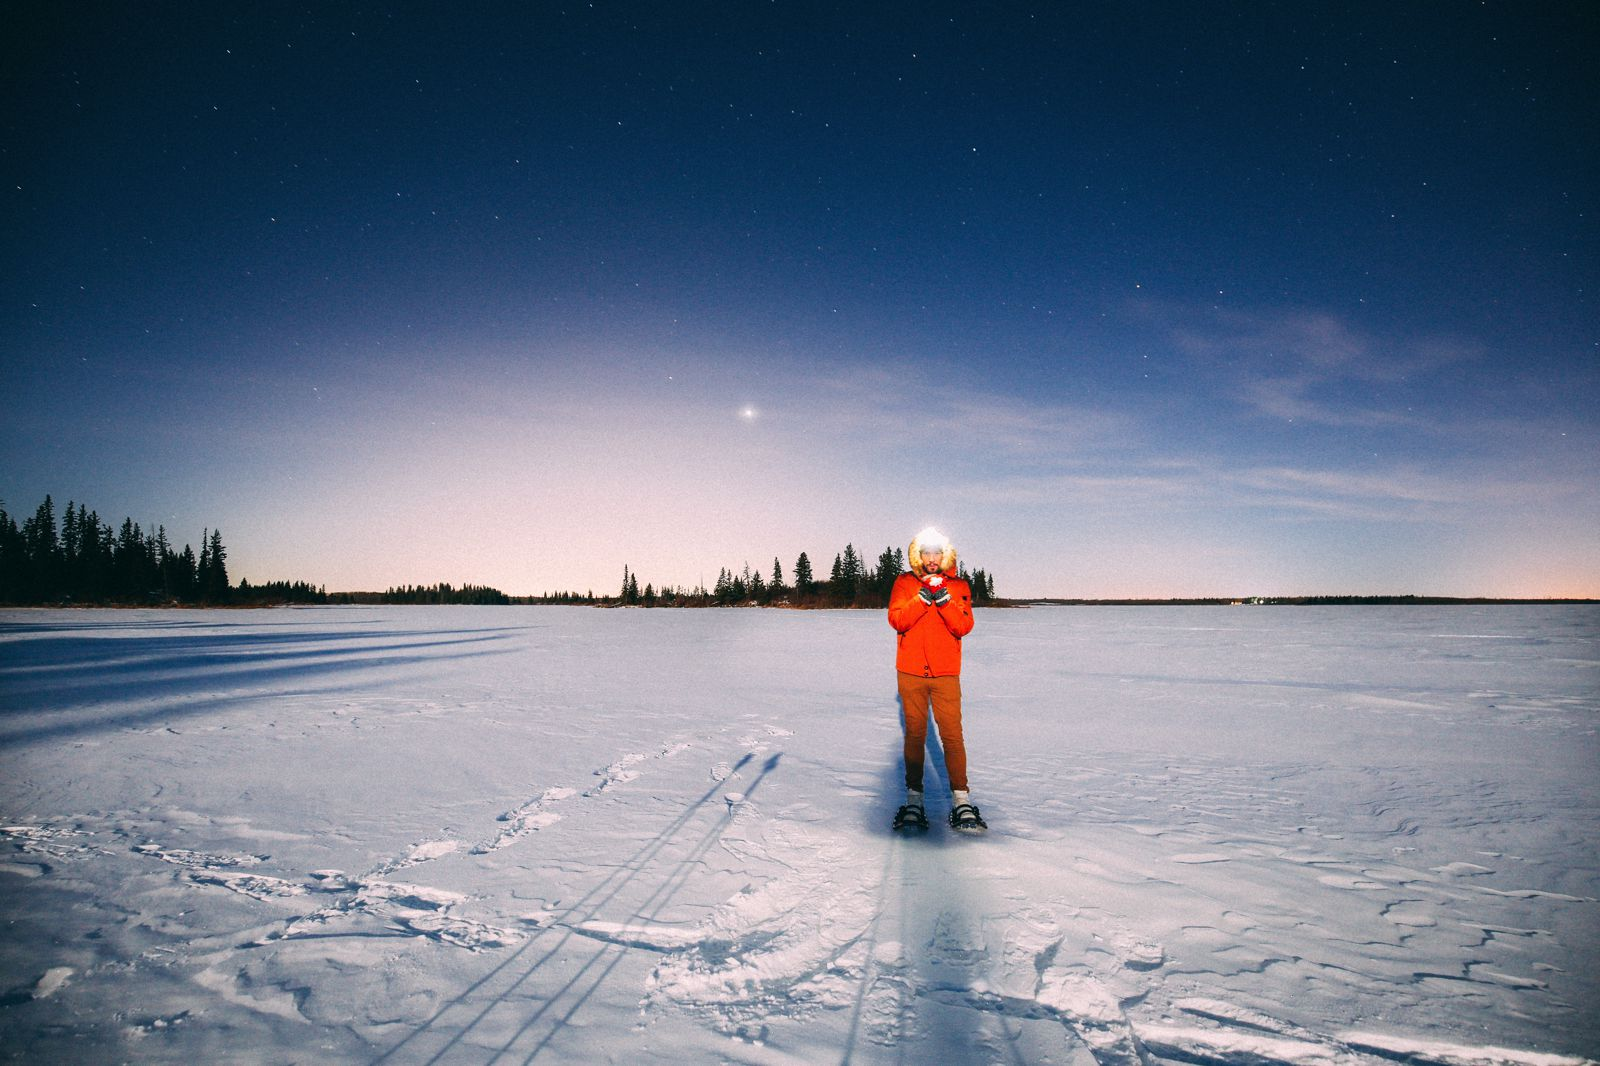 Midnight Moonlight Snowshoeing... In Edmonton, Canada (48)